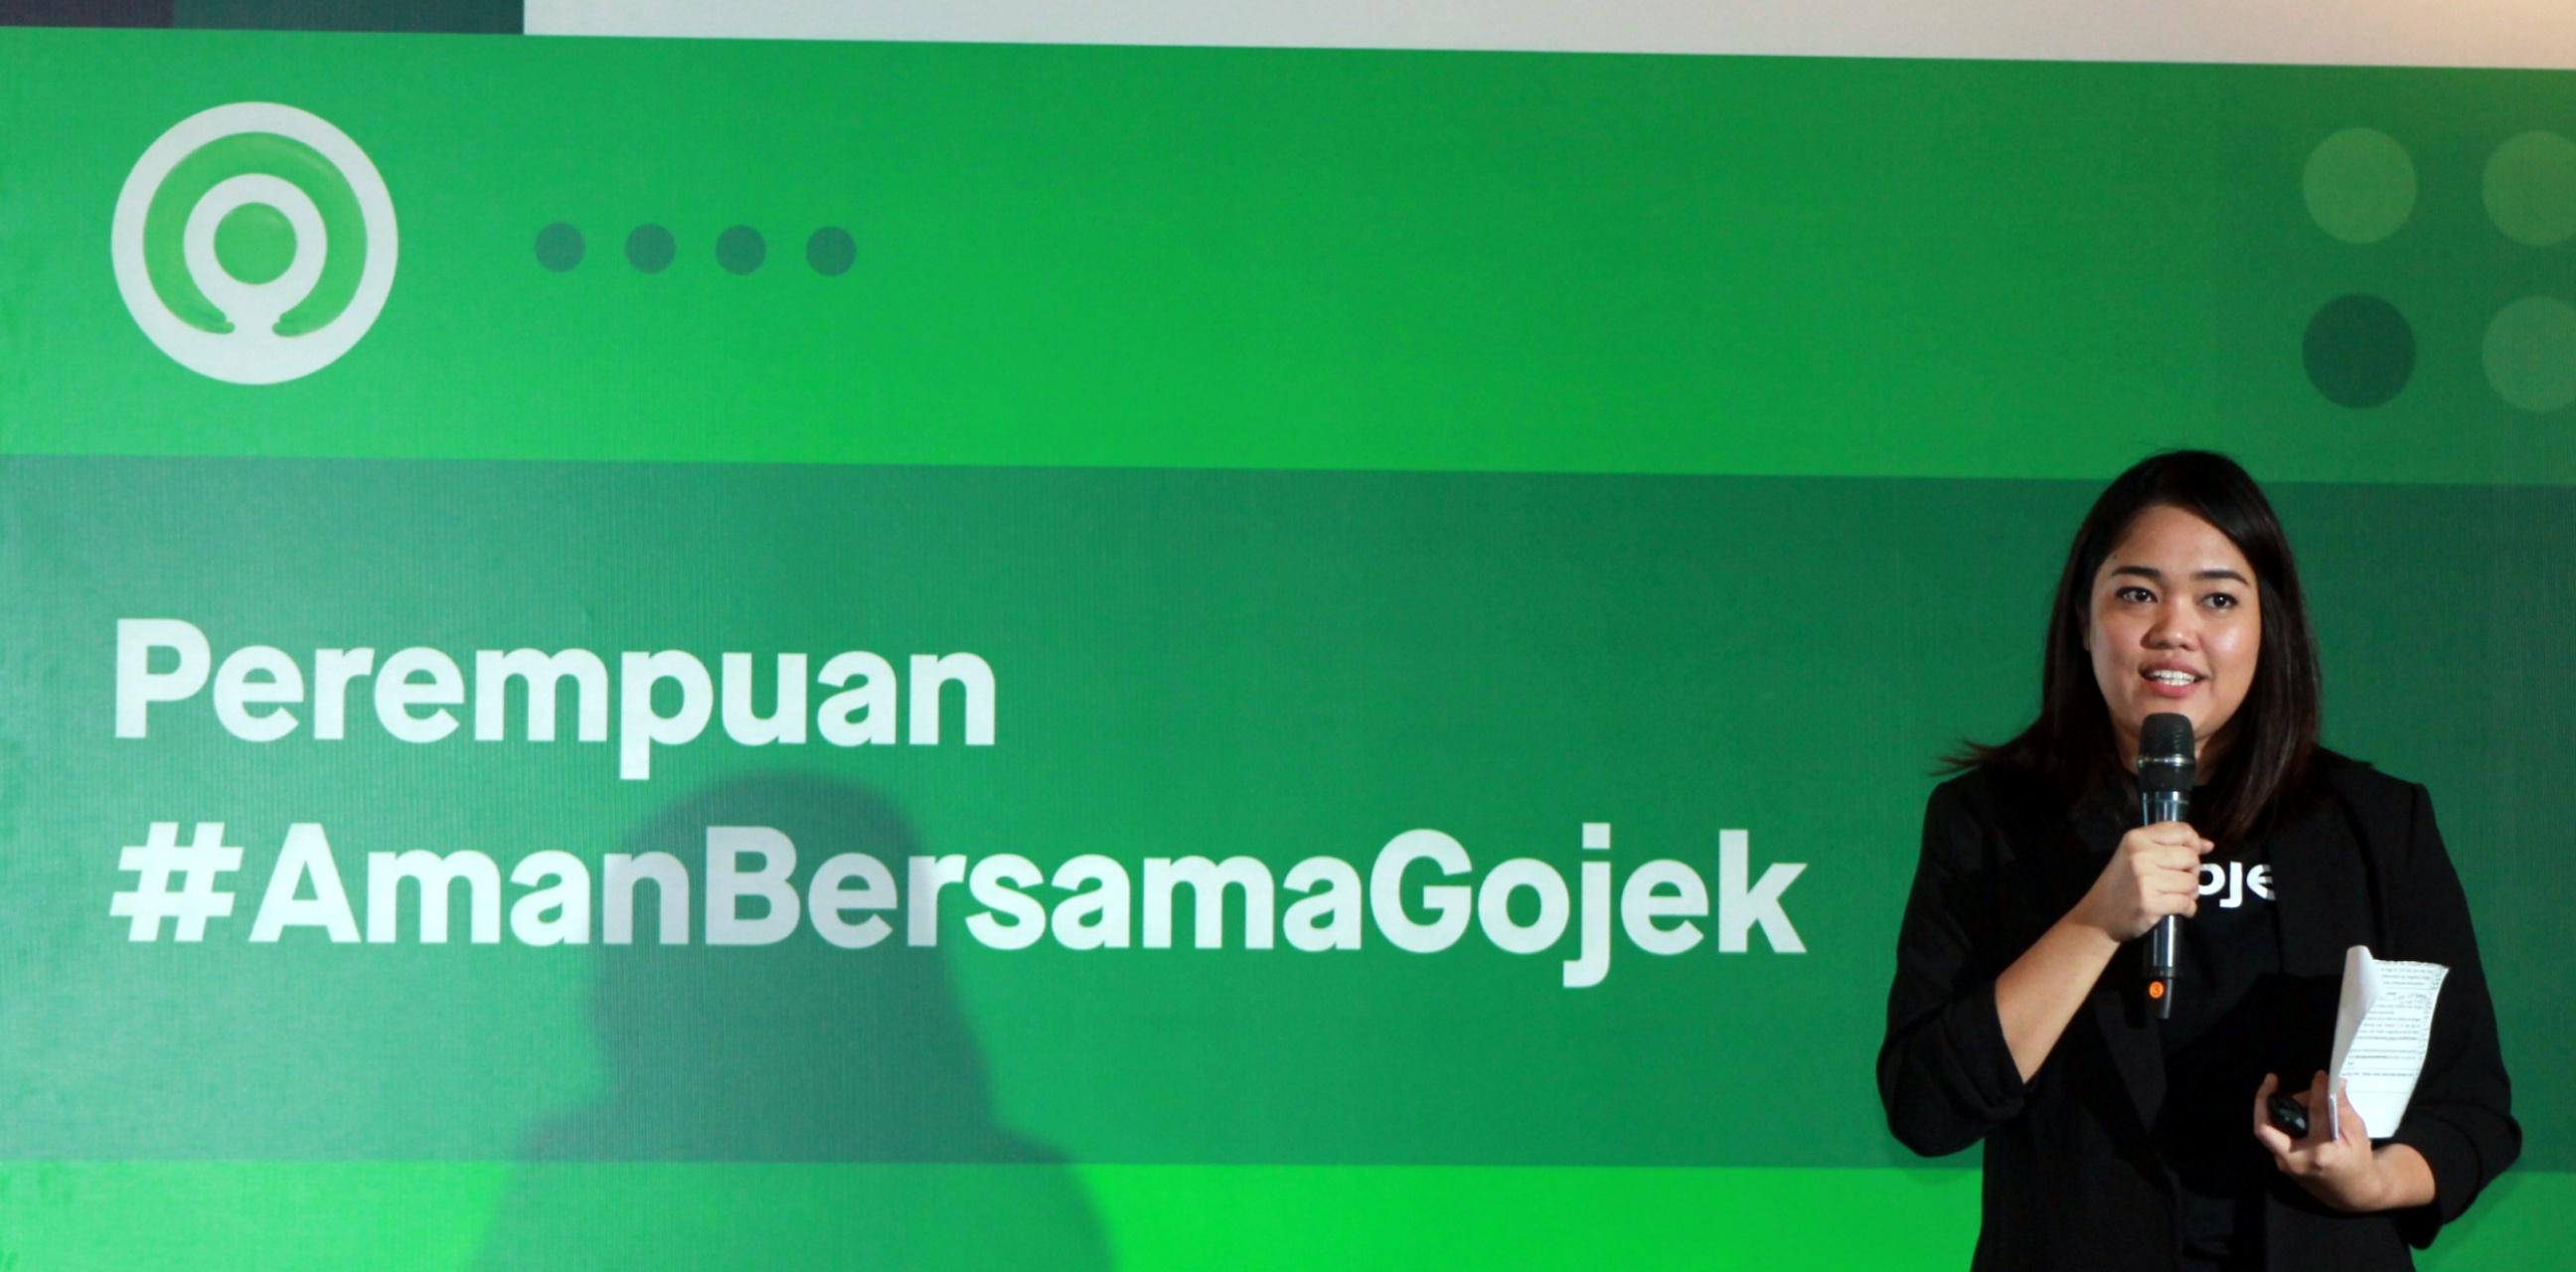 3 Alasan Gojek hadirkan transportasi yang bikin perempuan makin aman